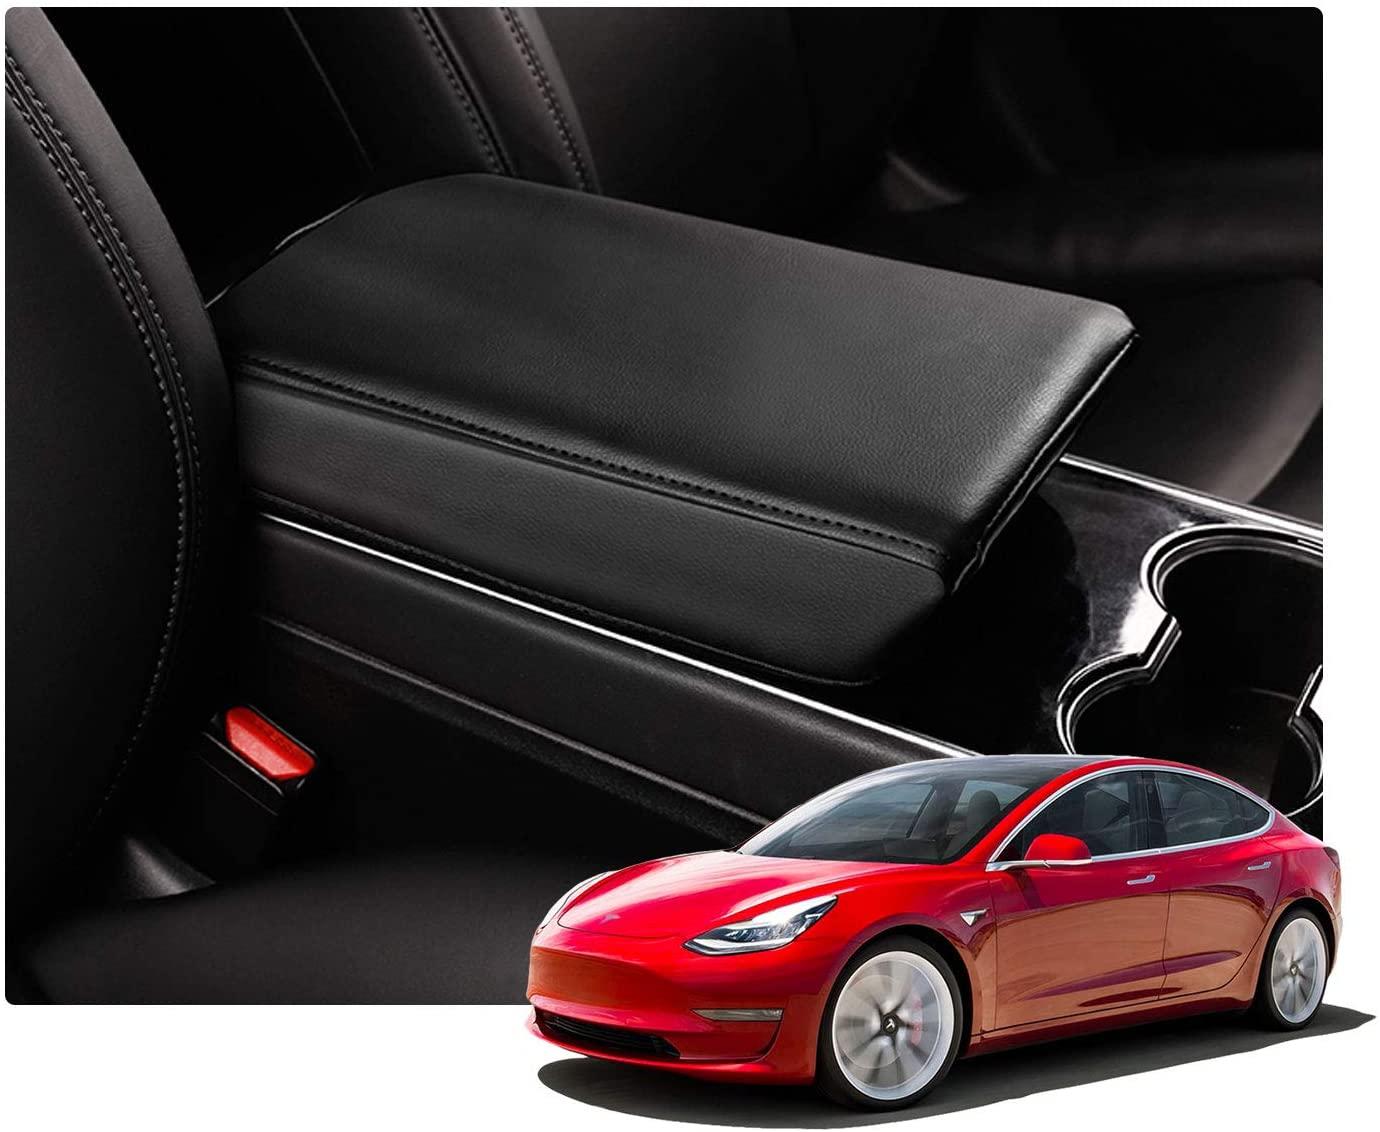 LFOTPP Interior Accessory for Tesla Model 3 Tesla Model Y Armrest Cover Car Center Console Lid Cover Armrest Box Cover Protector, Armrest Case Protector Protective Cover (Black Leather)